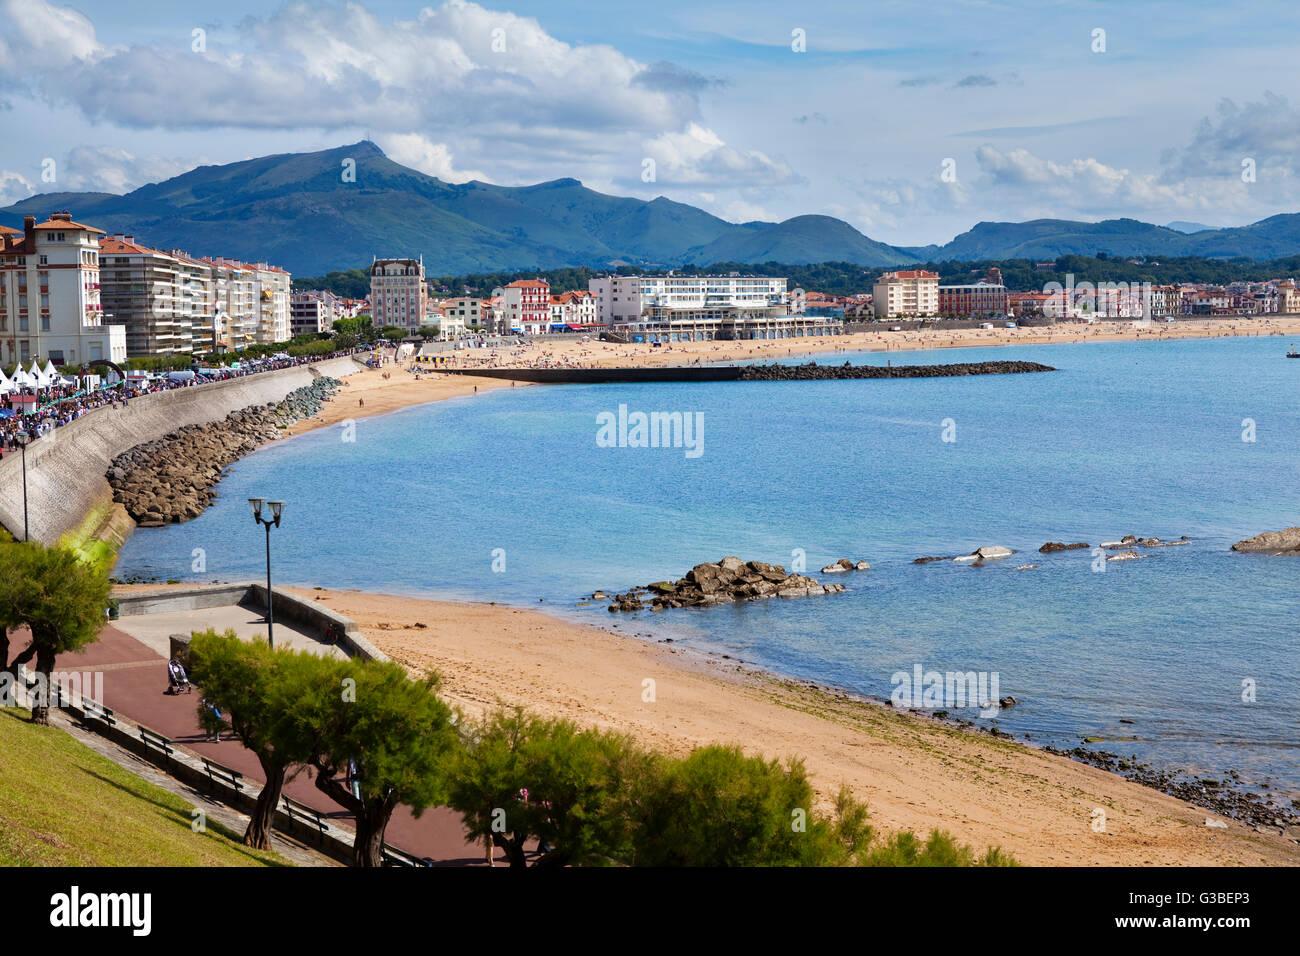 saint jean de luz beach in pays basque france stock photo royalty free image 105359243 alamy. Black Bedroom Furniture Sets. Home Design Ideas